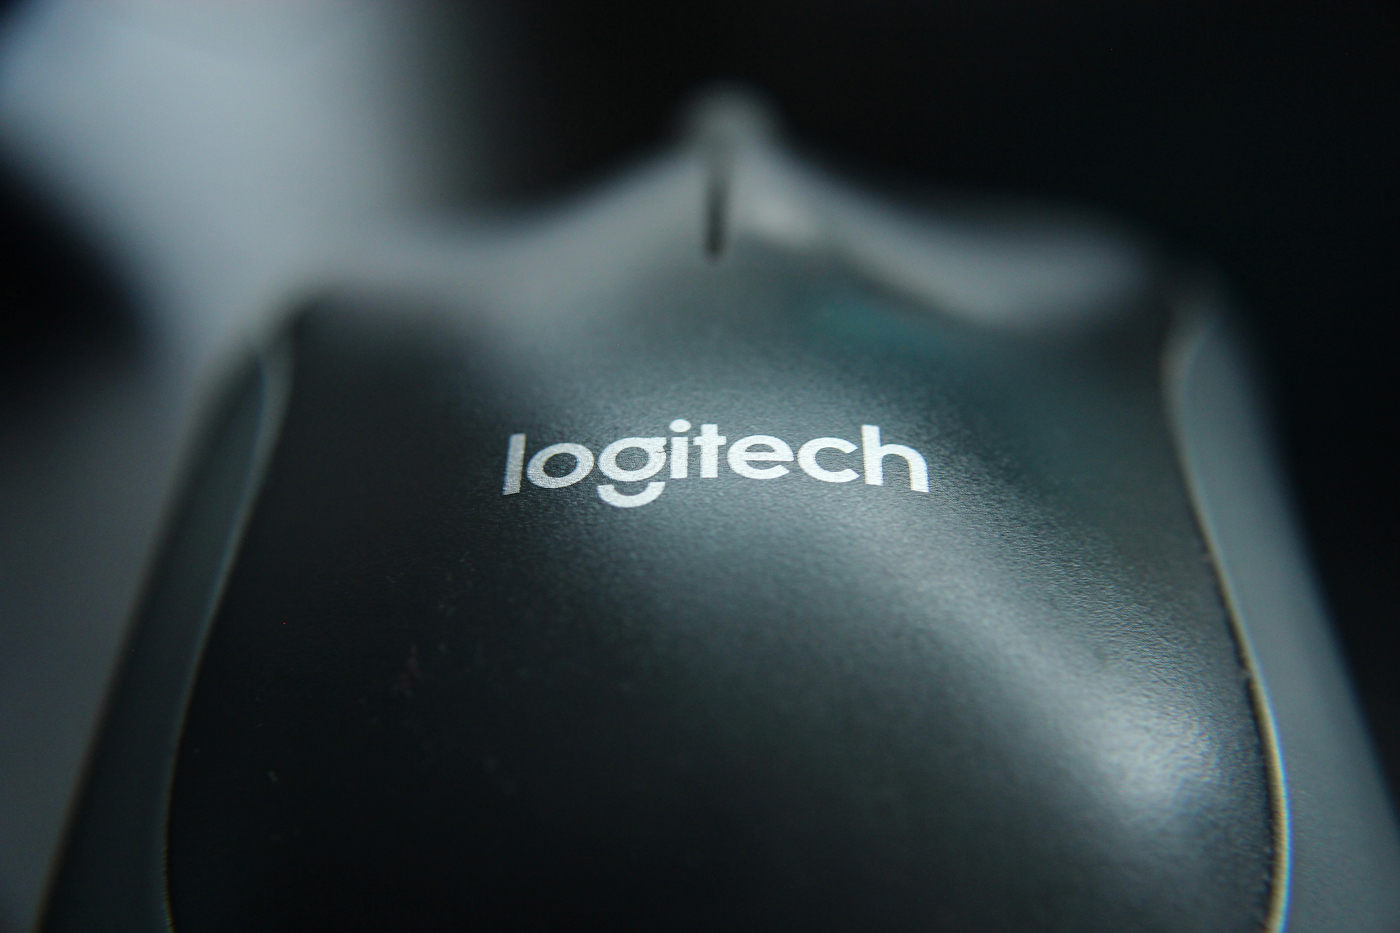 Logitech LOGI stock news and analysis